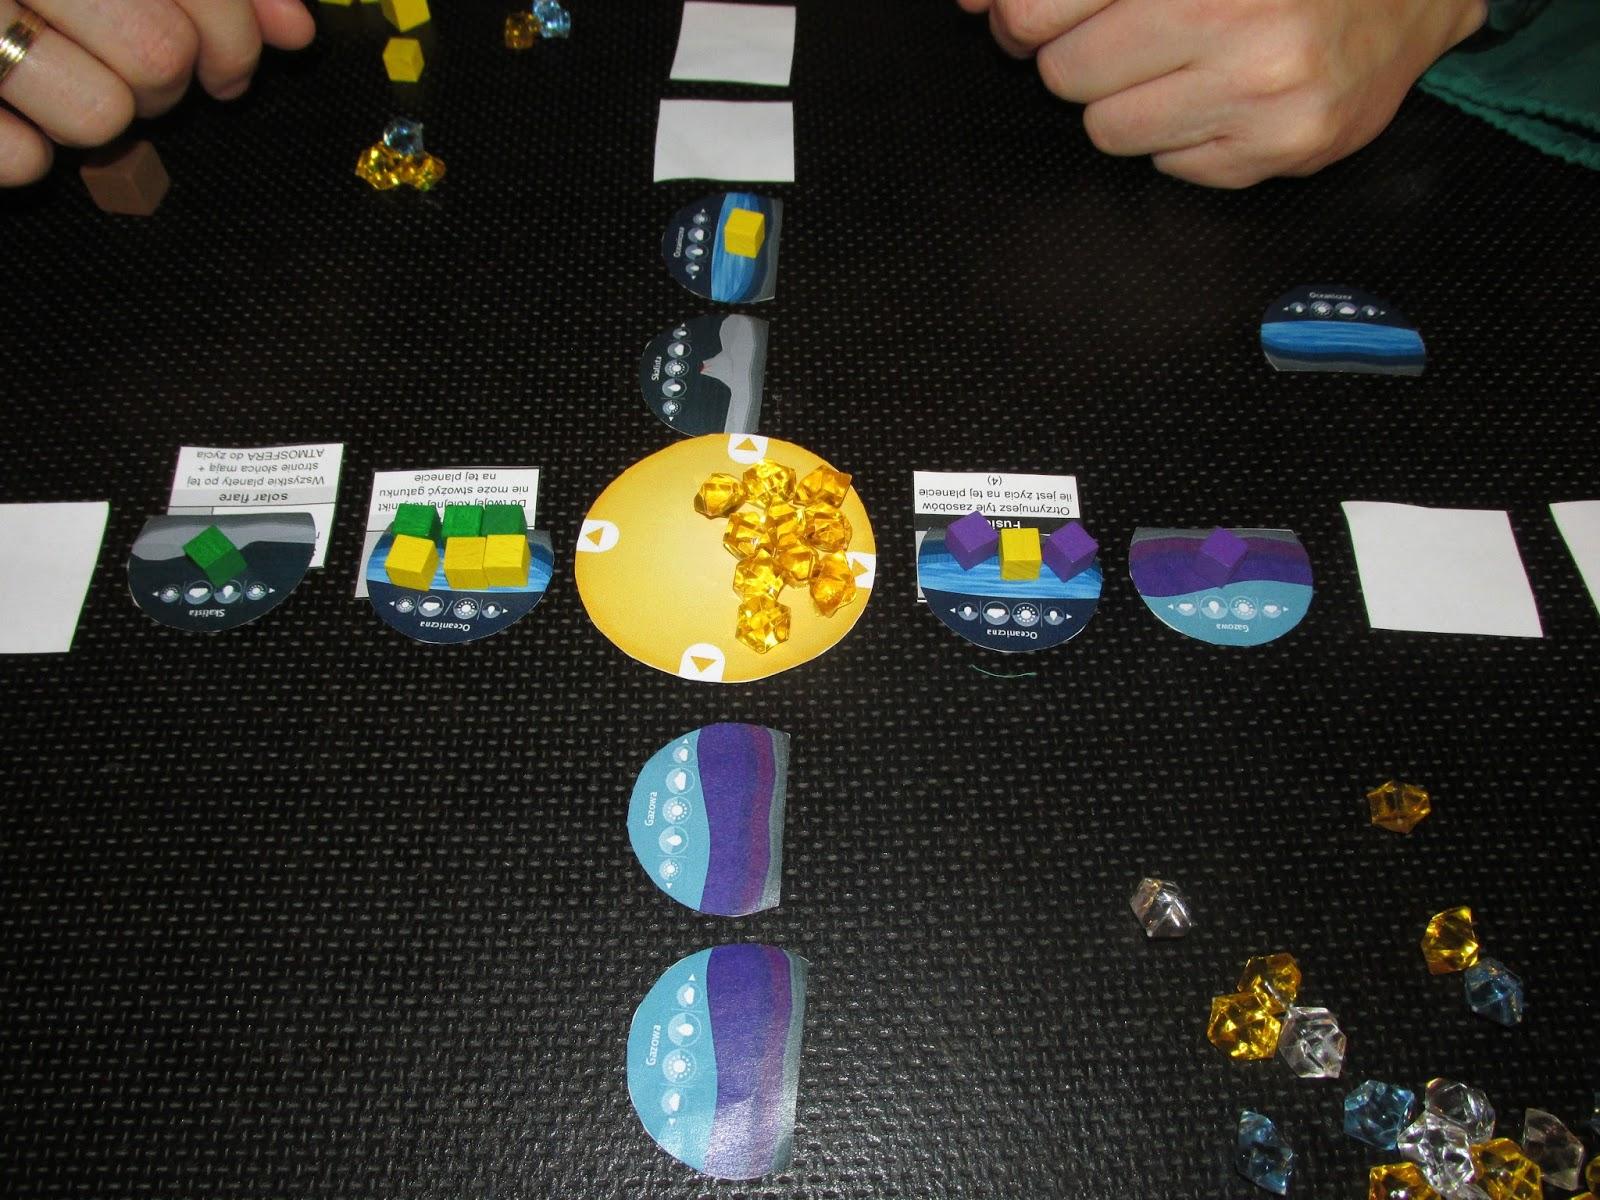 http://planszowki.blogspot.com/2015/03/exoplanets-prototyp.html